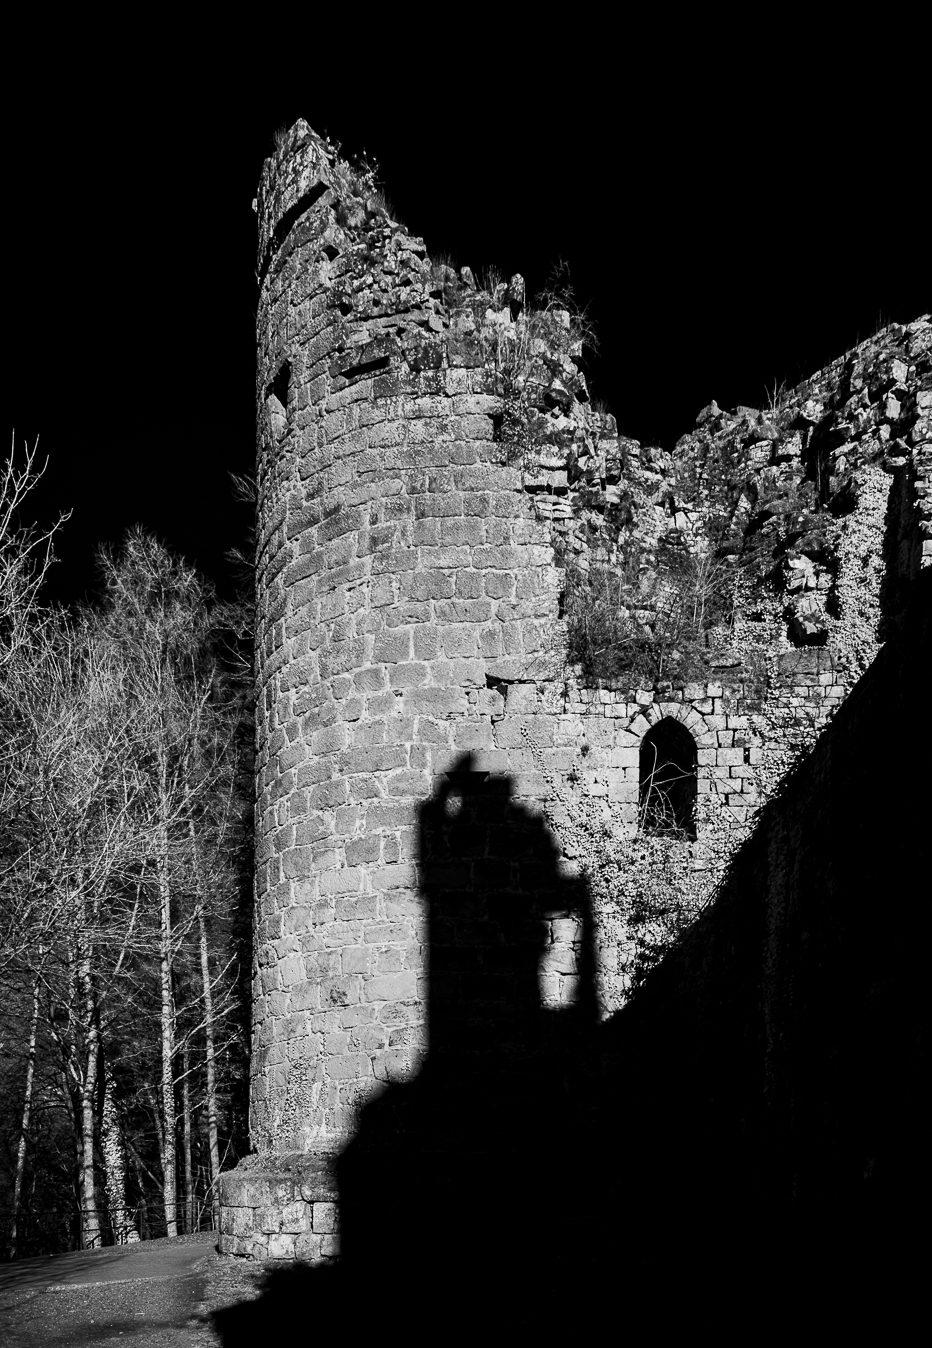 Burg Neuscharfeneck #1